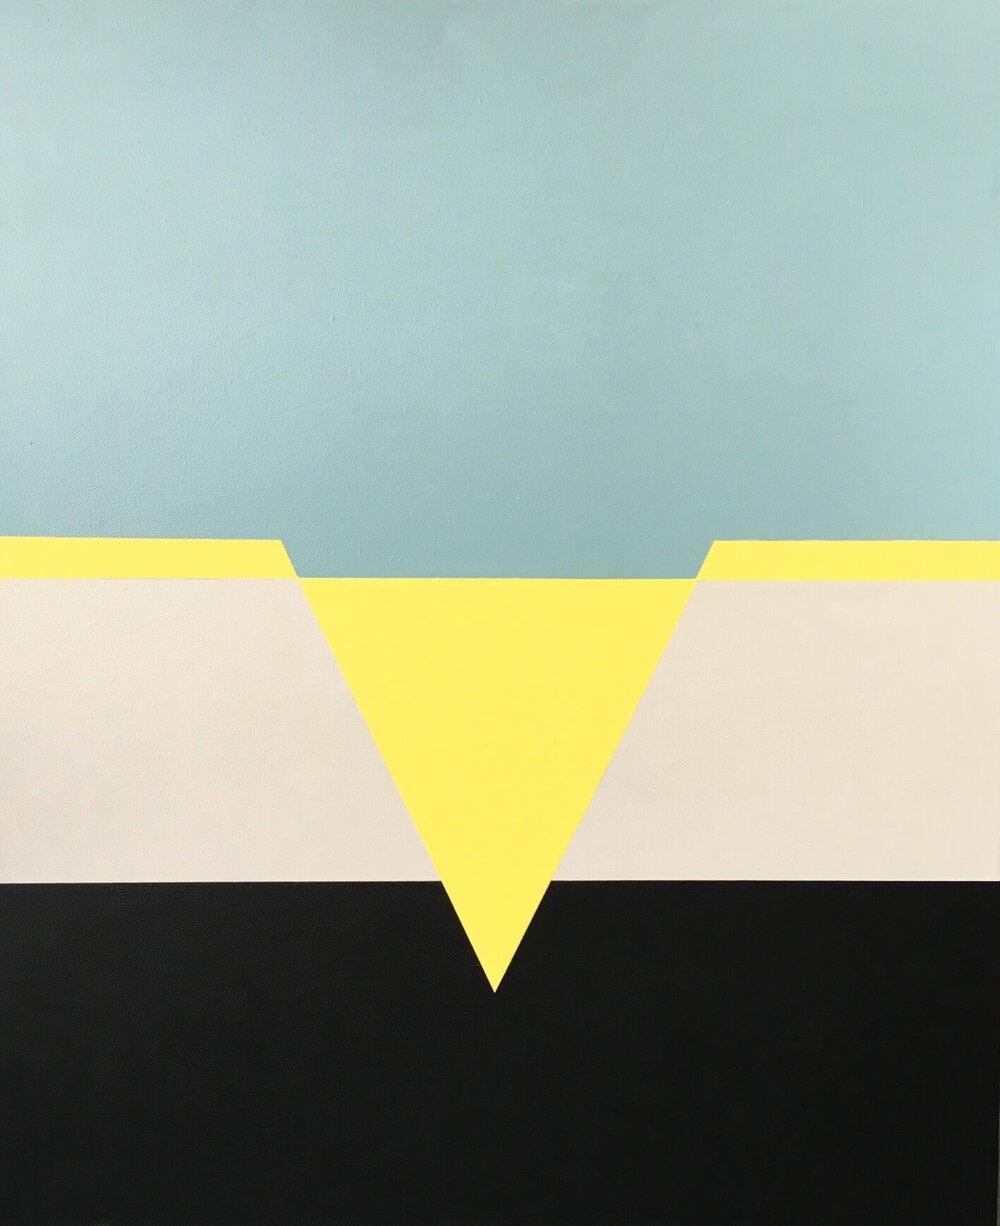 Minimal 13, 60 cm x 50 x 4 cm, Acryl auf Leinwand, © Ute Latzke, 2016, Preis: 300 Euro.